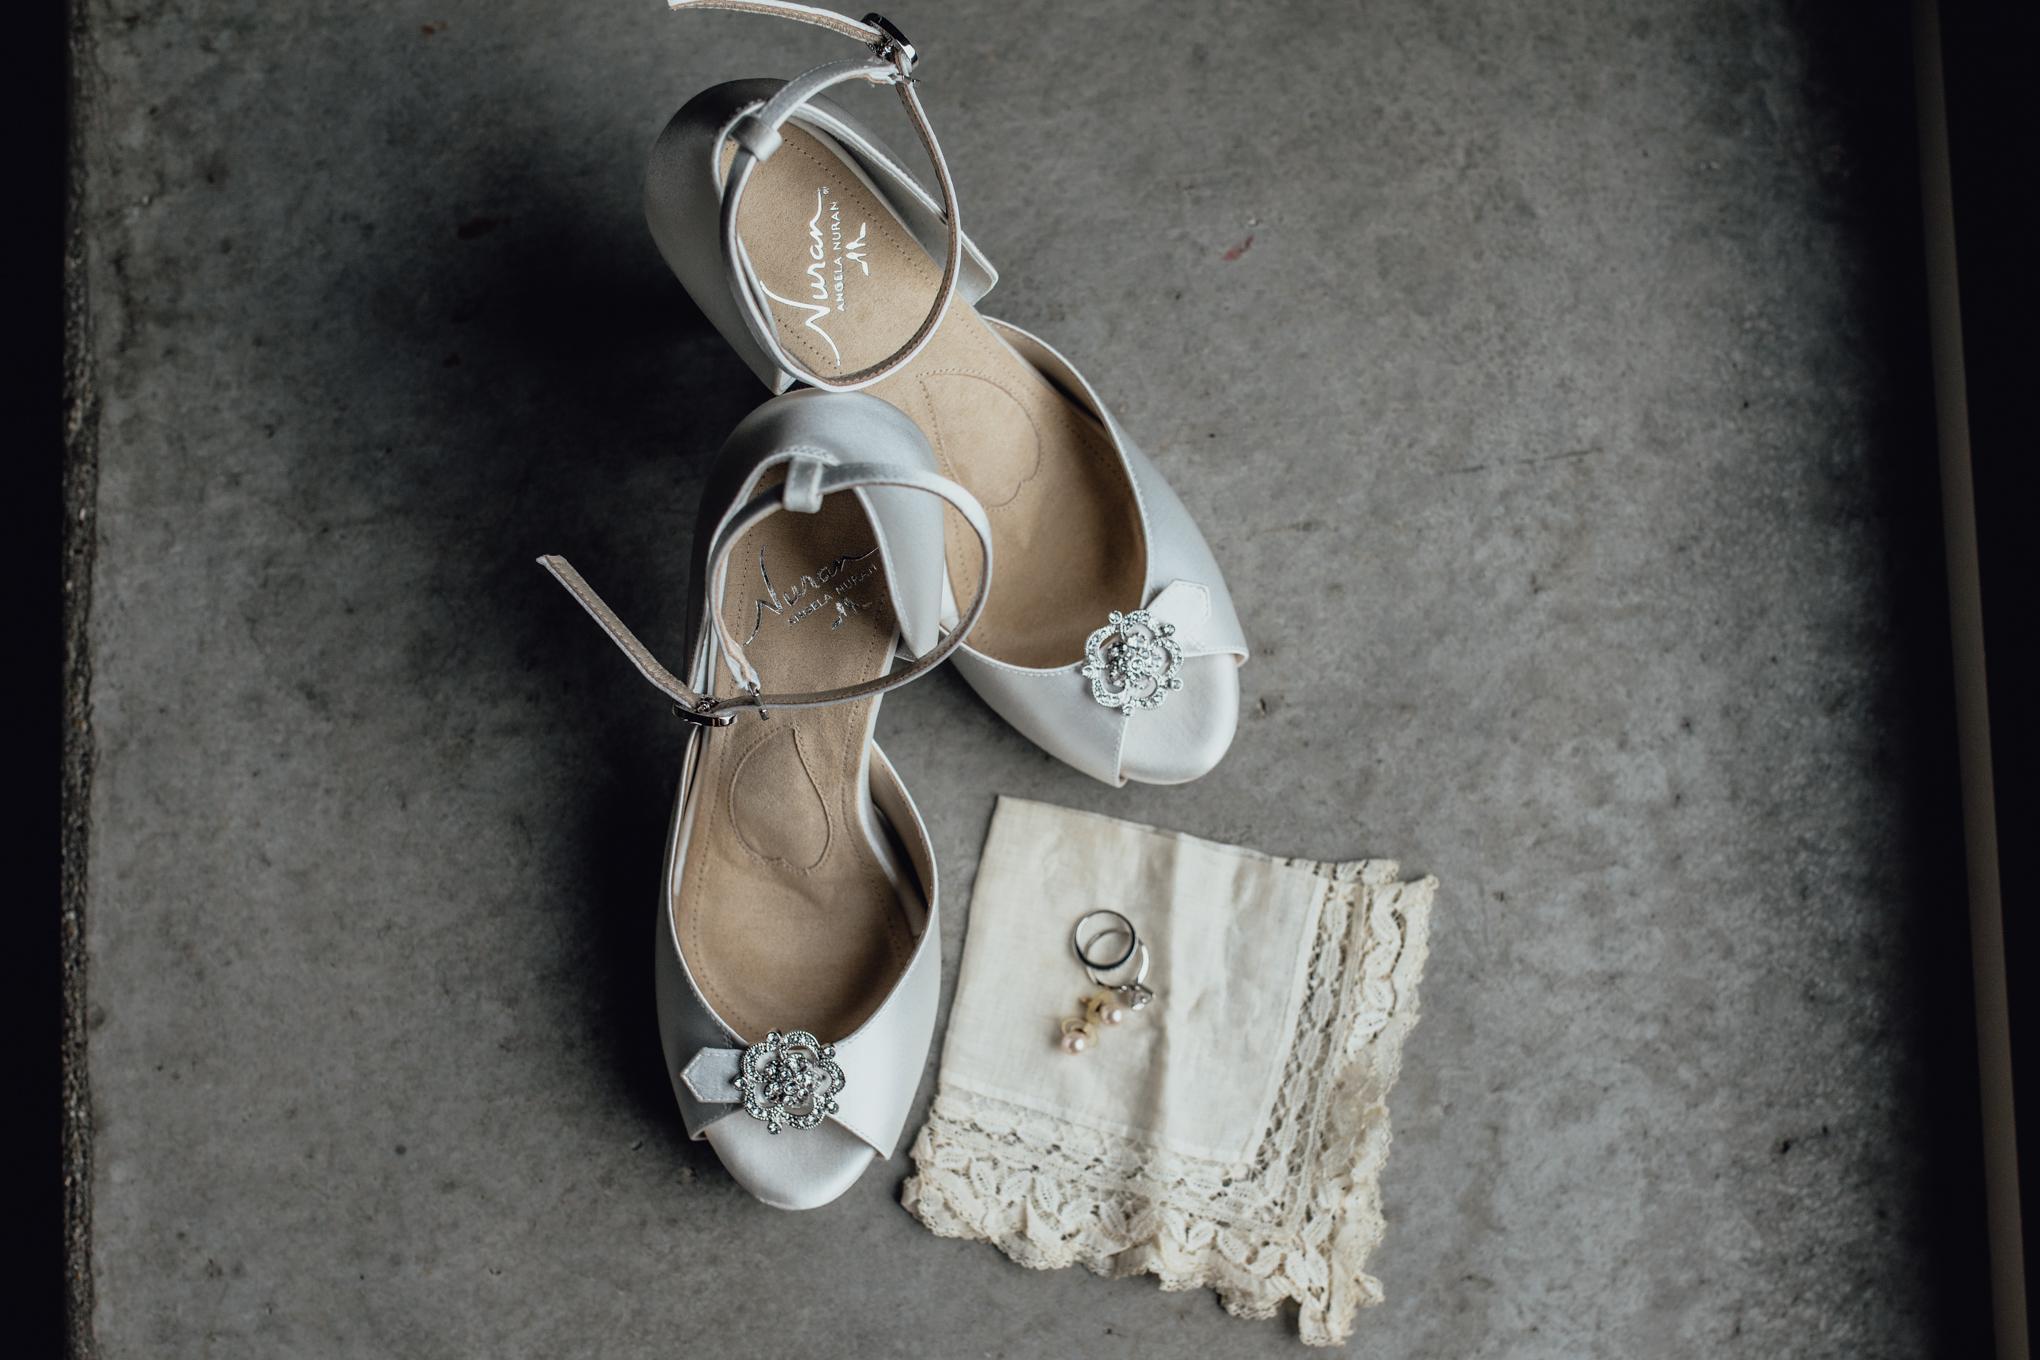 brides-shoe-detail-and-rings.jpg